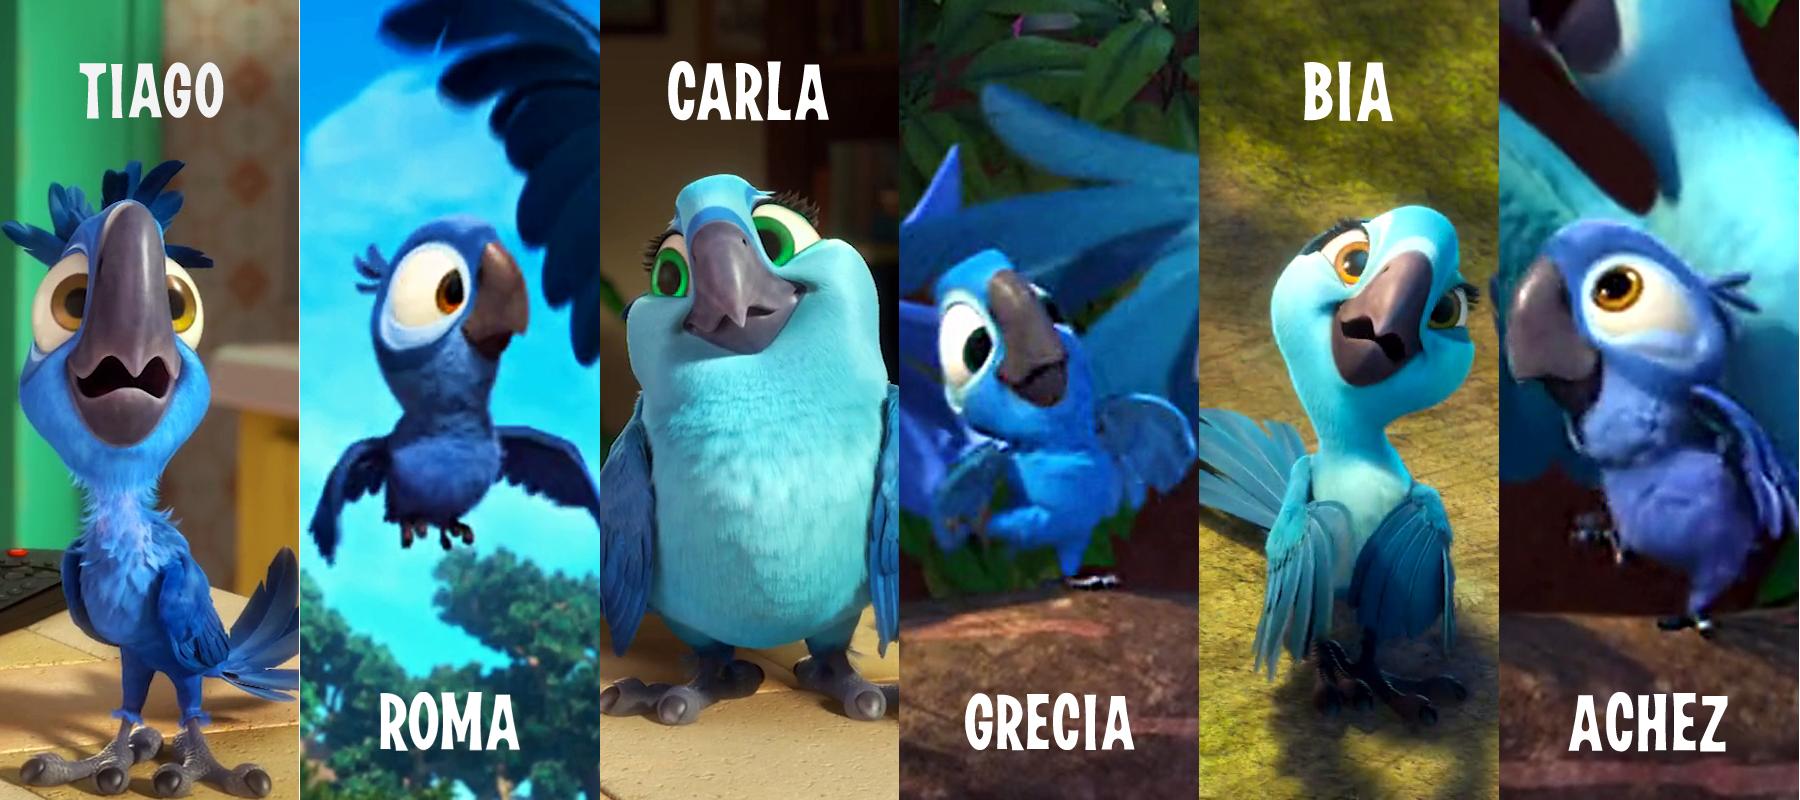 Blue macaws in rio - photo#9